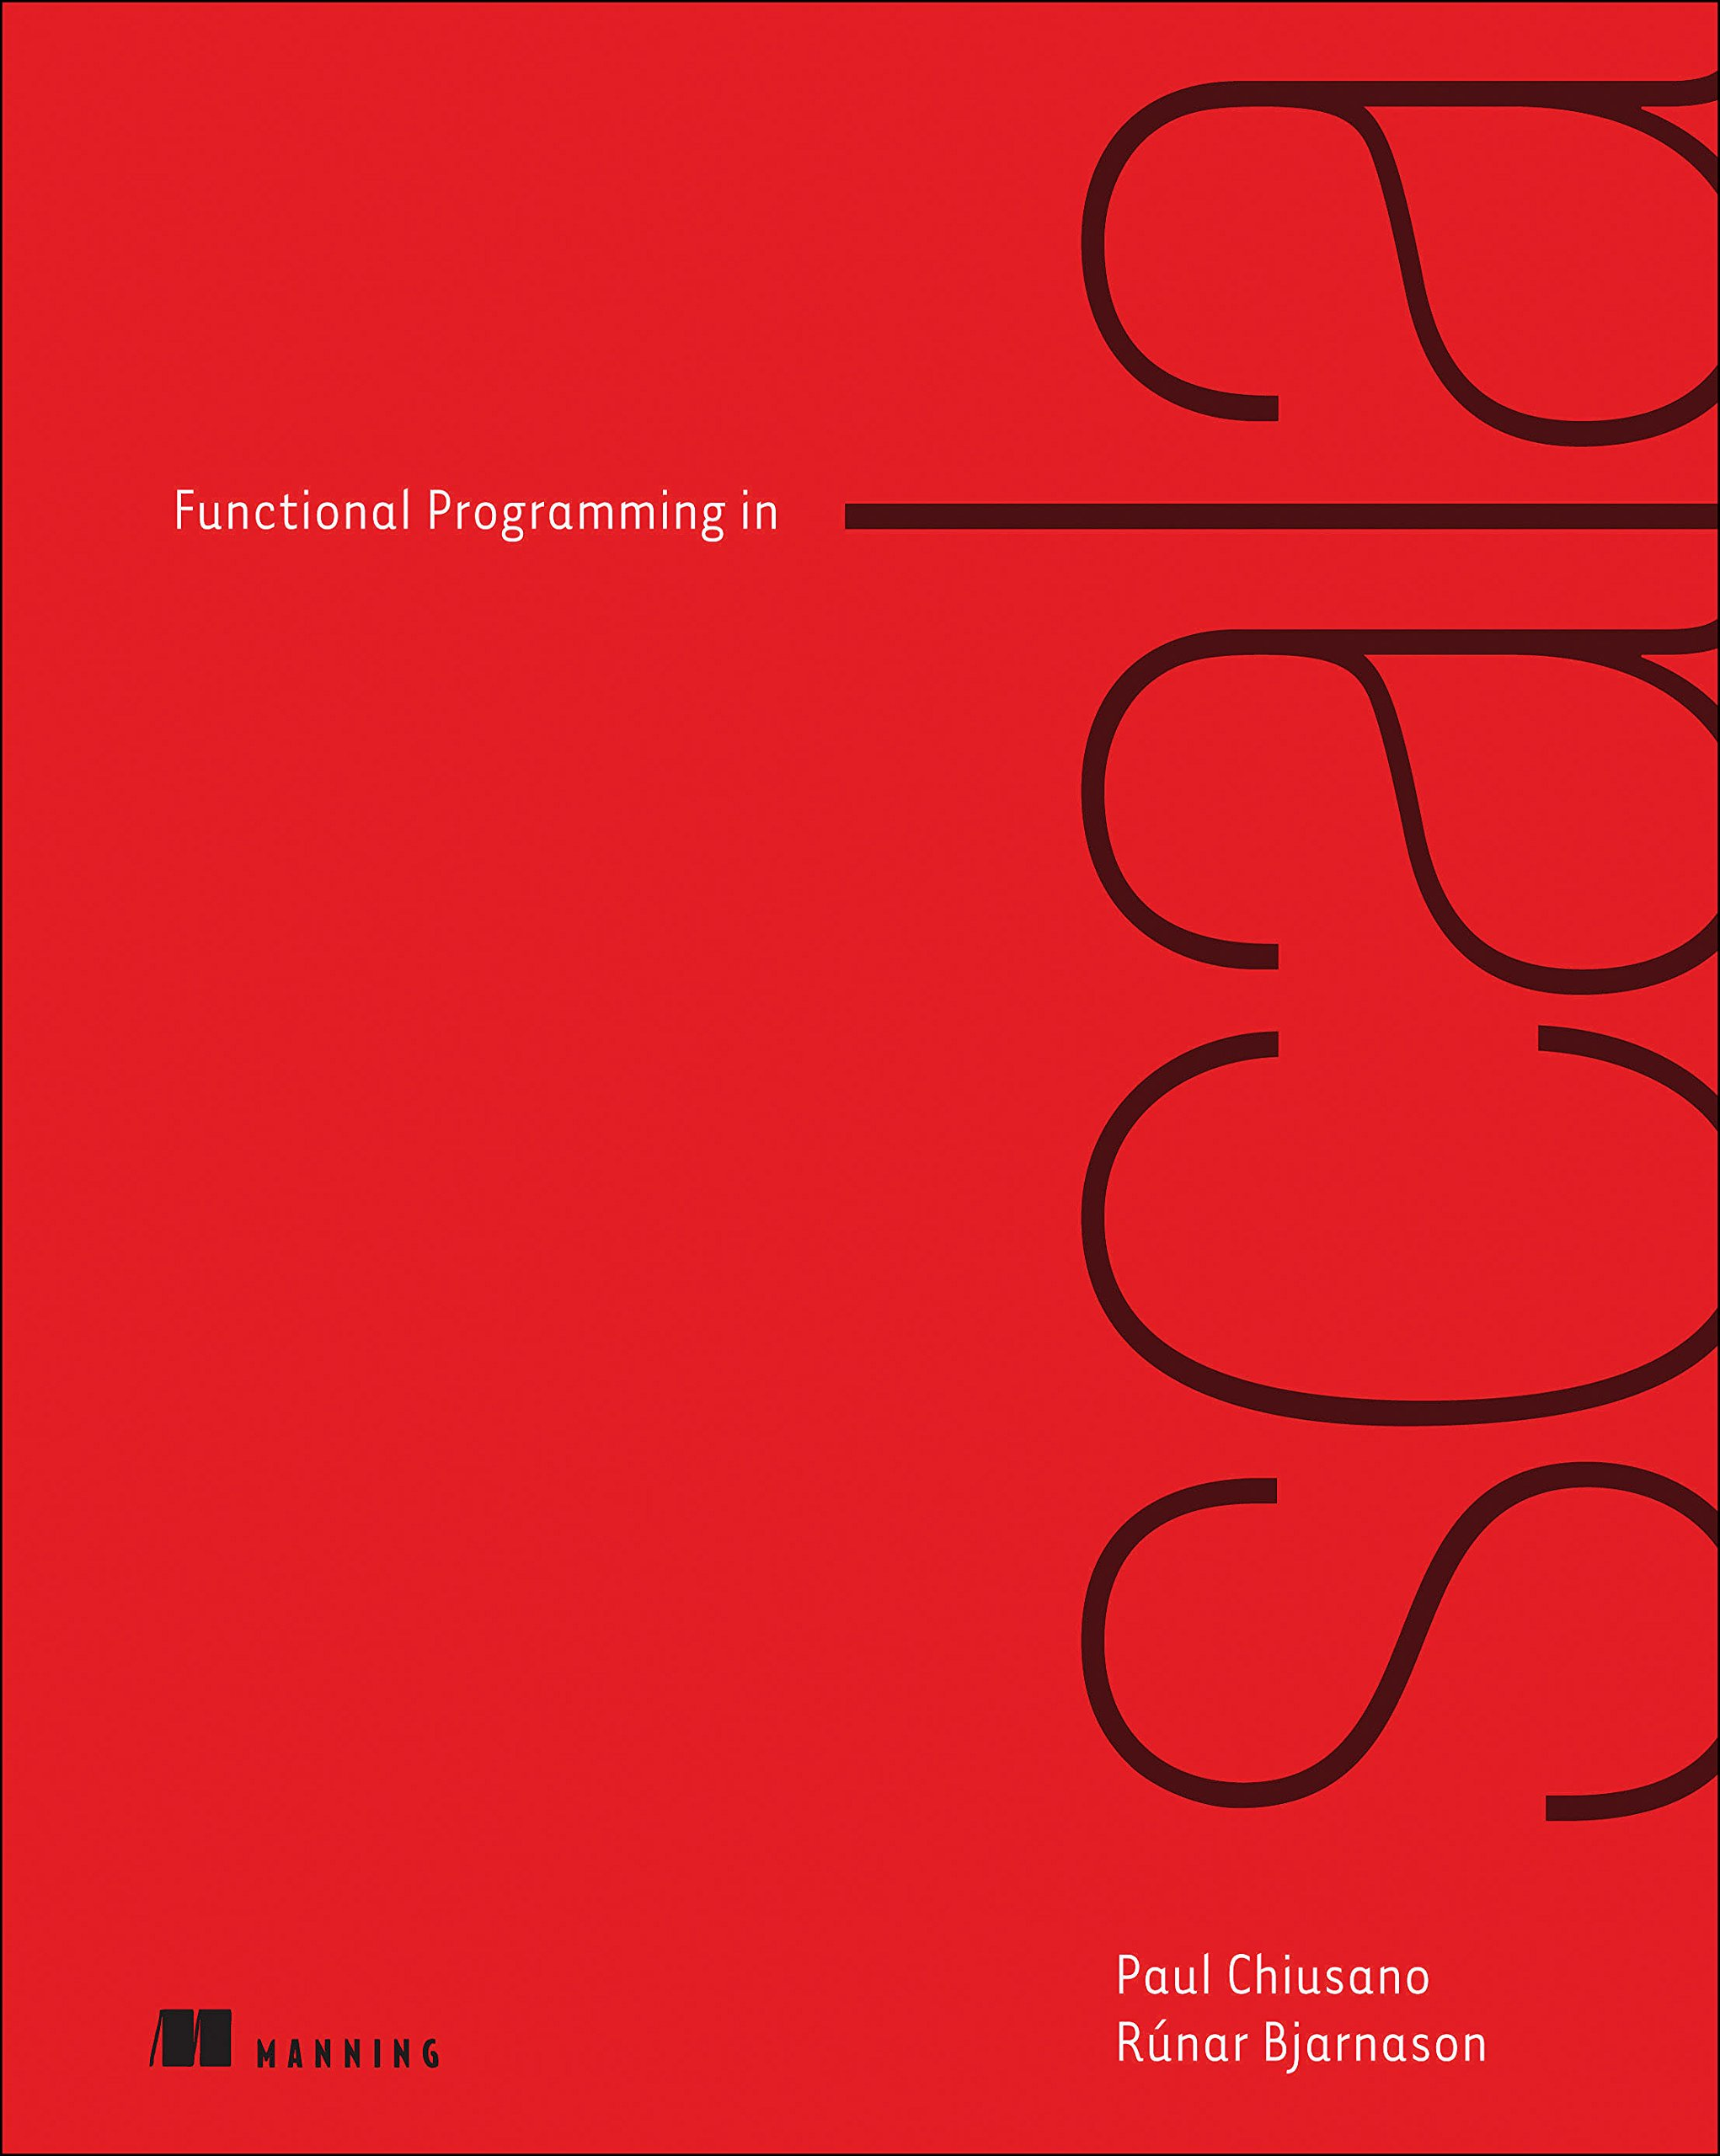 Functional Programming in Scala ISBN-13 9781617290657